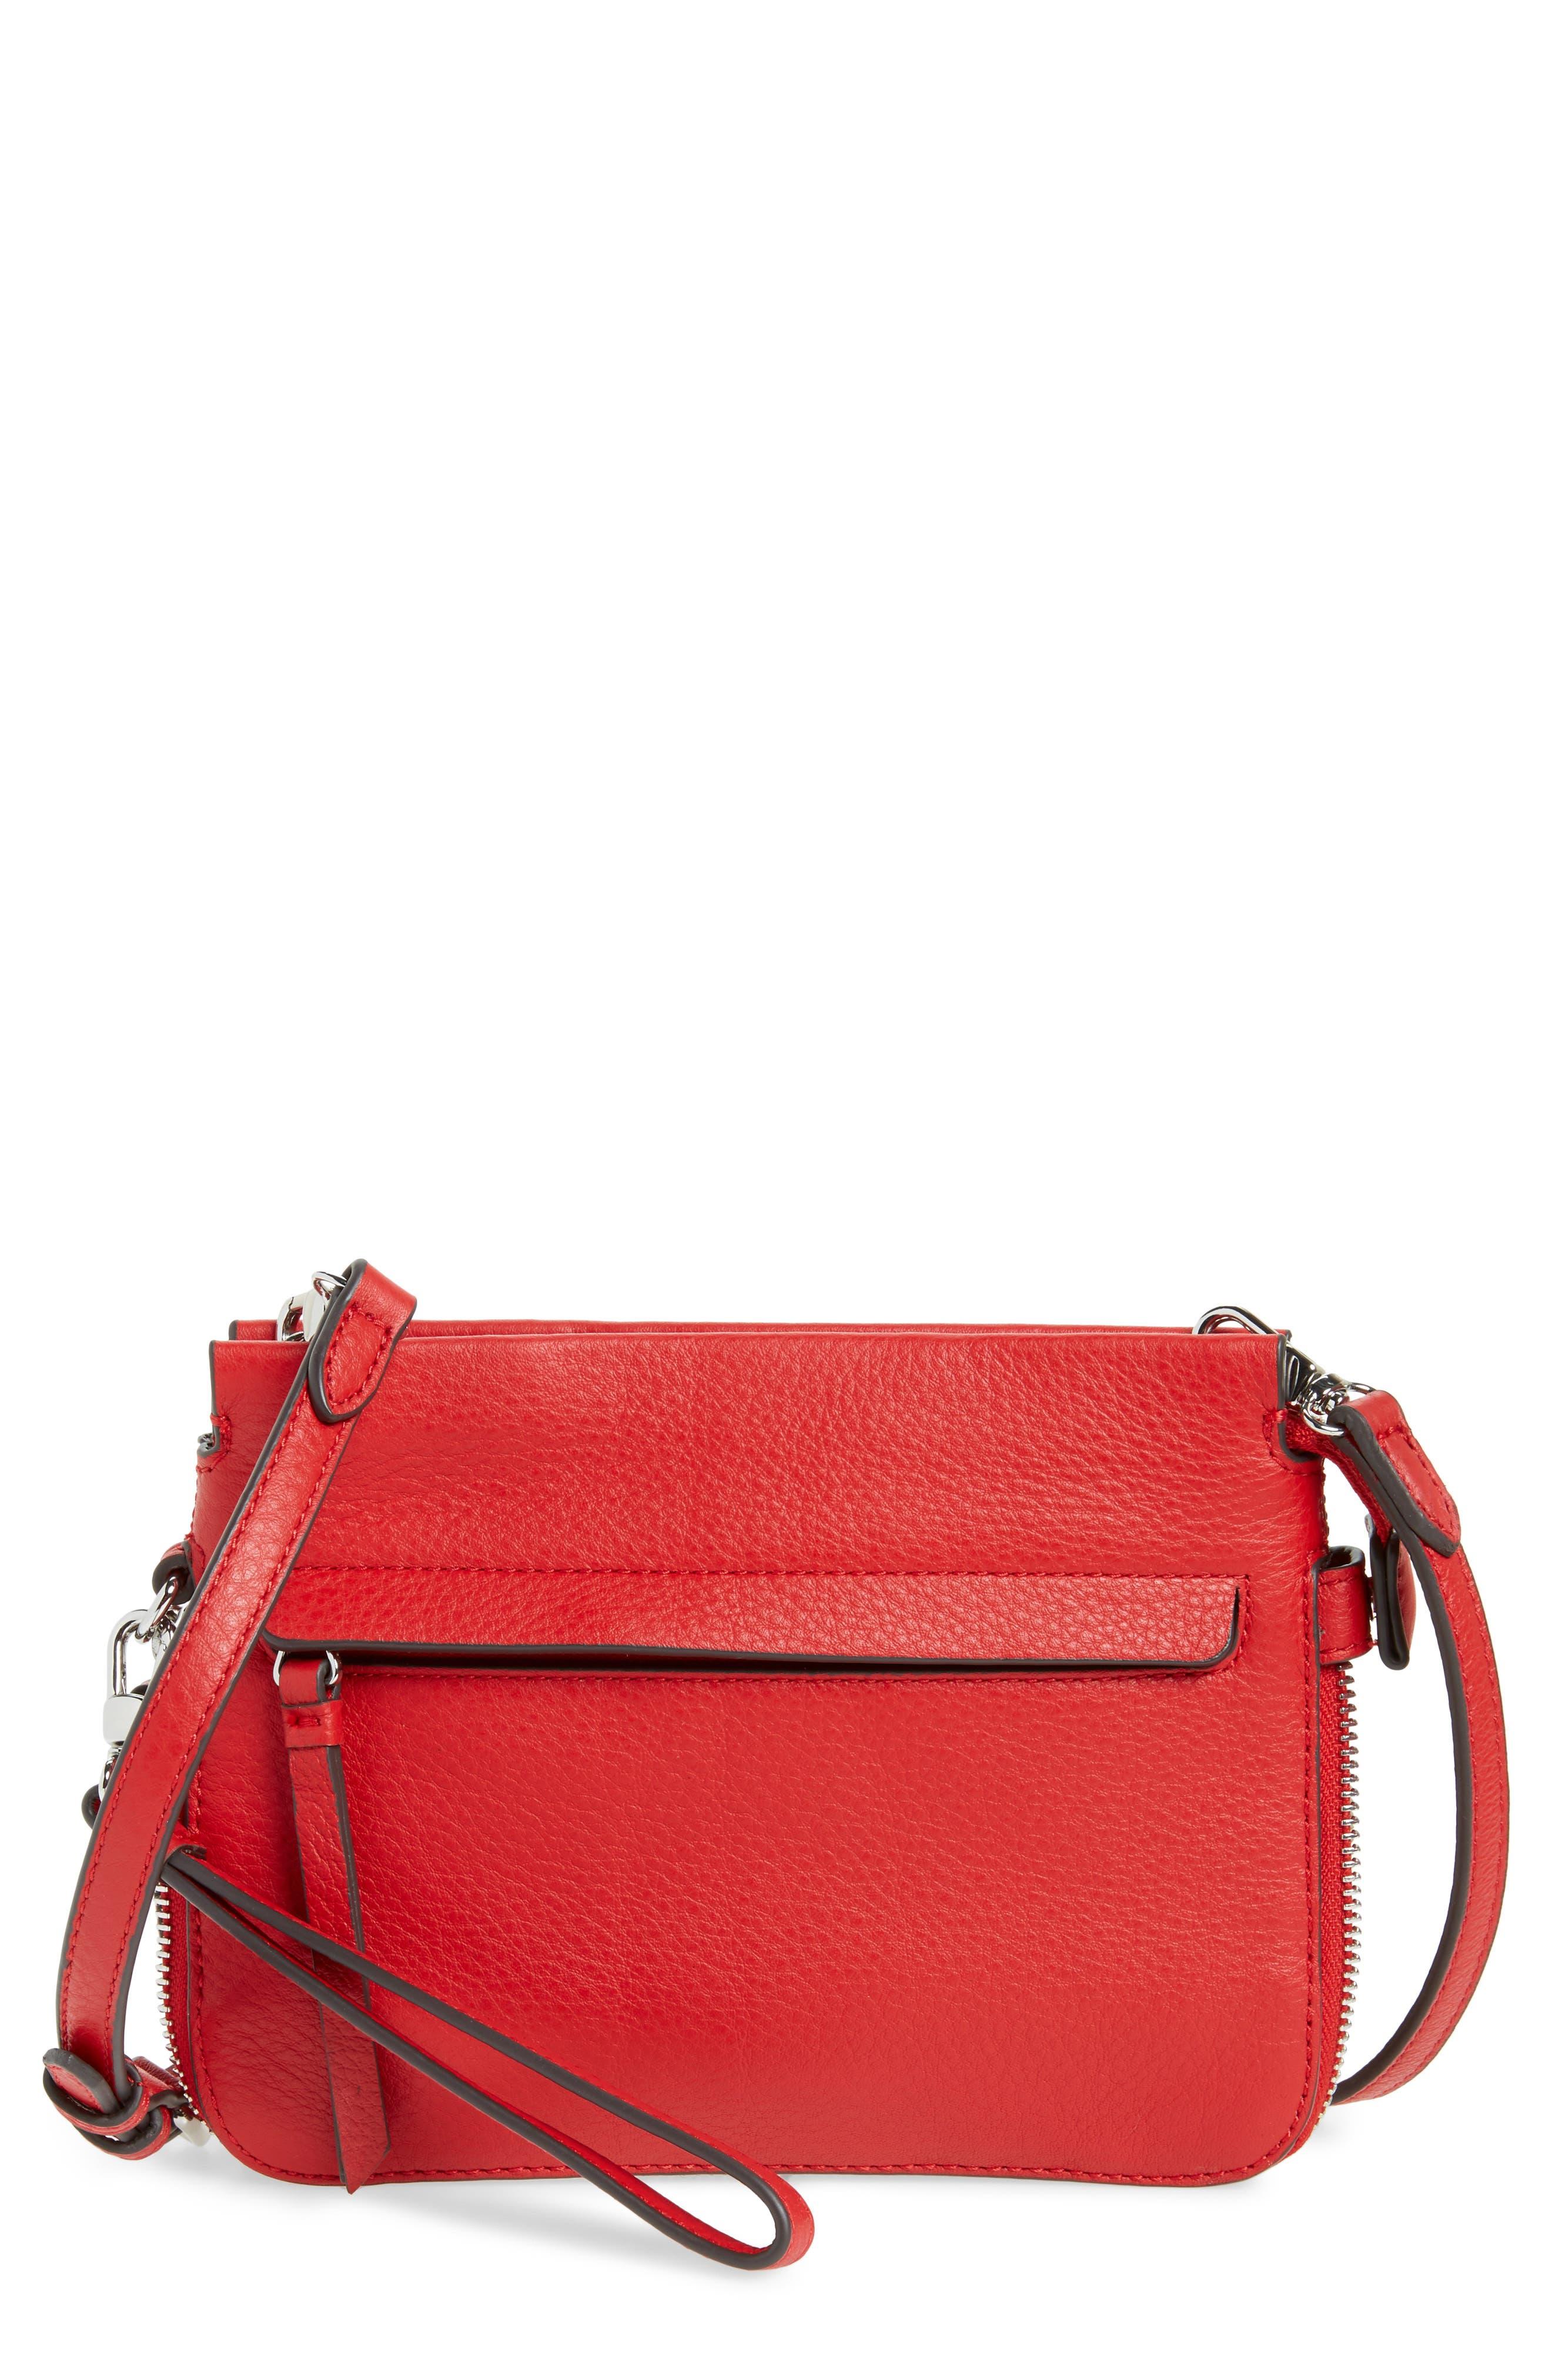 Vince Camuto Small Edsel Leather Crossbody Bag